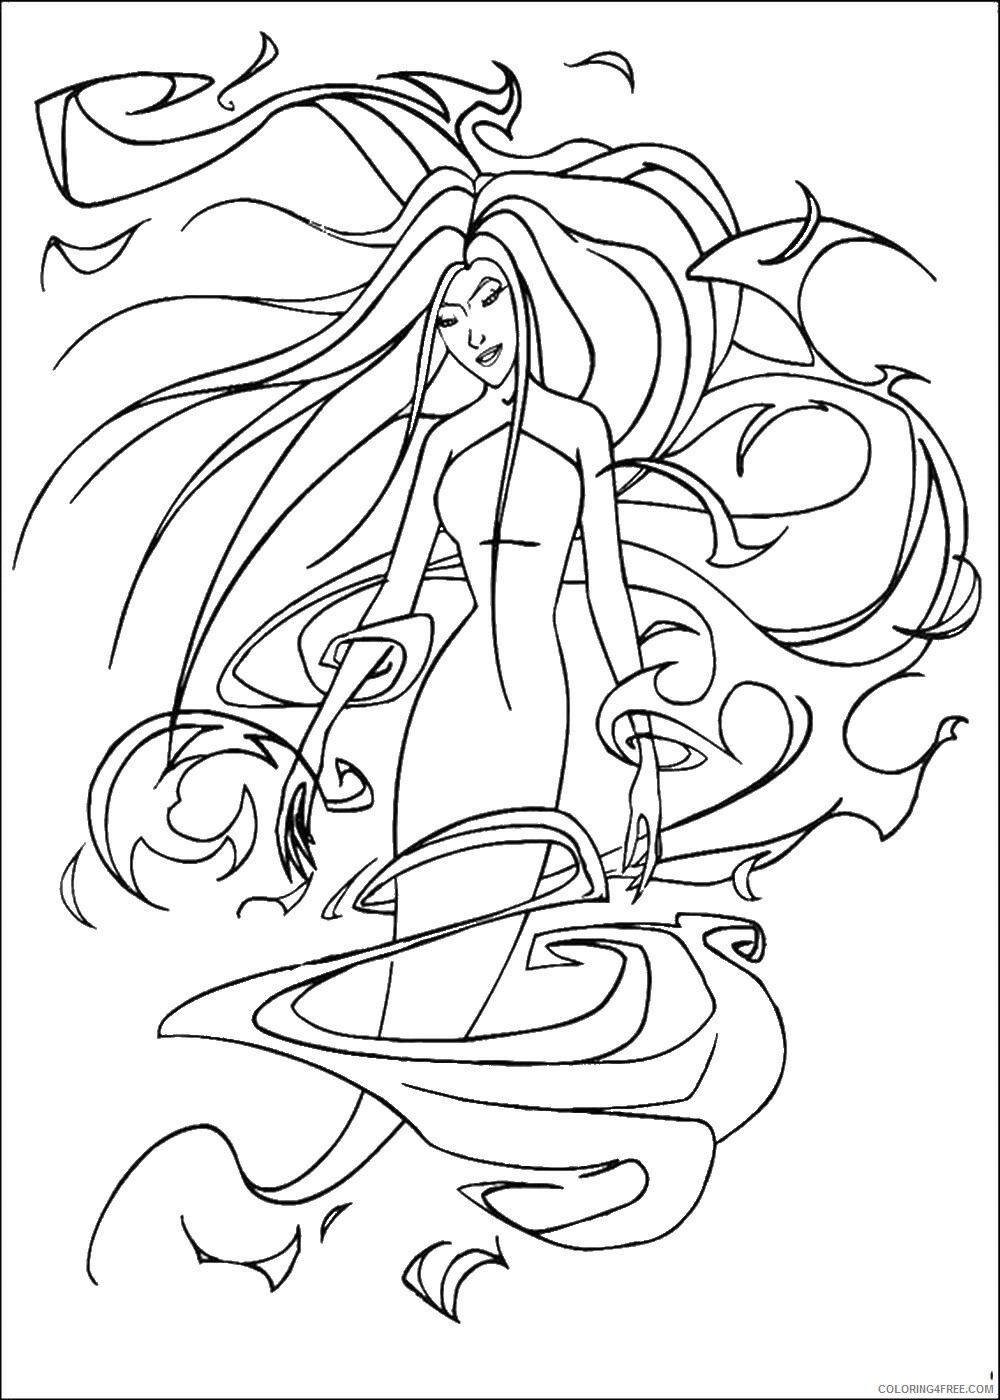 Sinbad Coloring Pages TV Film sinbad_cl_13 Printable 2020 07565 Coloring4free